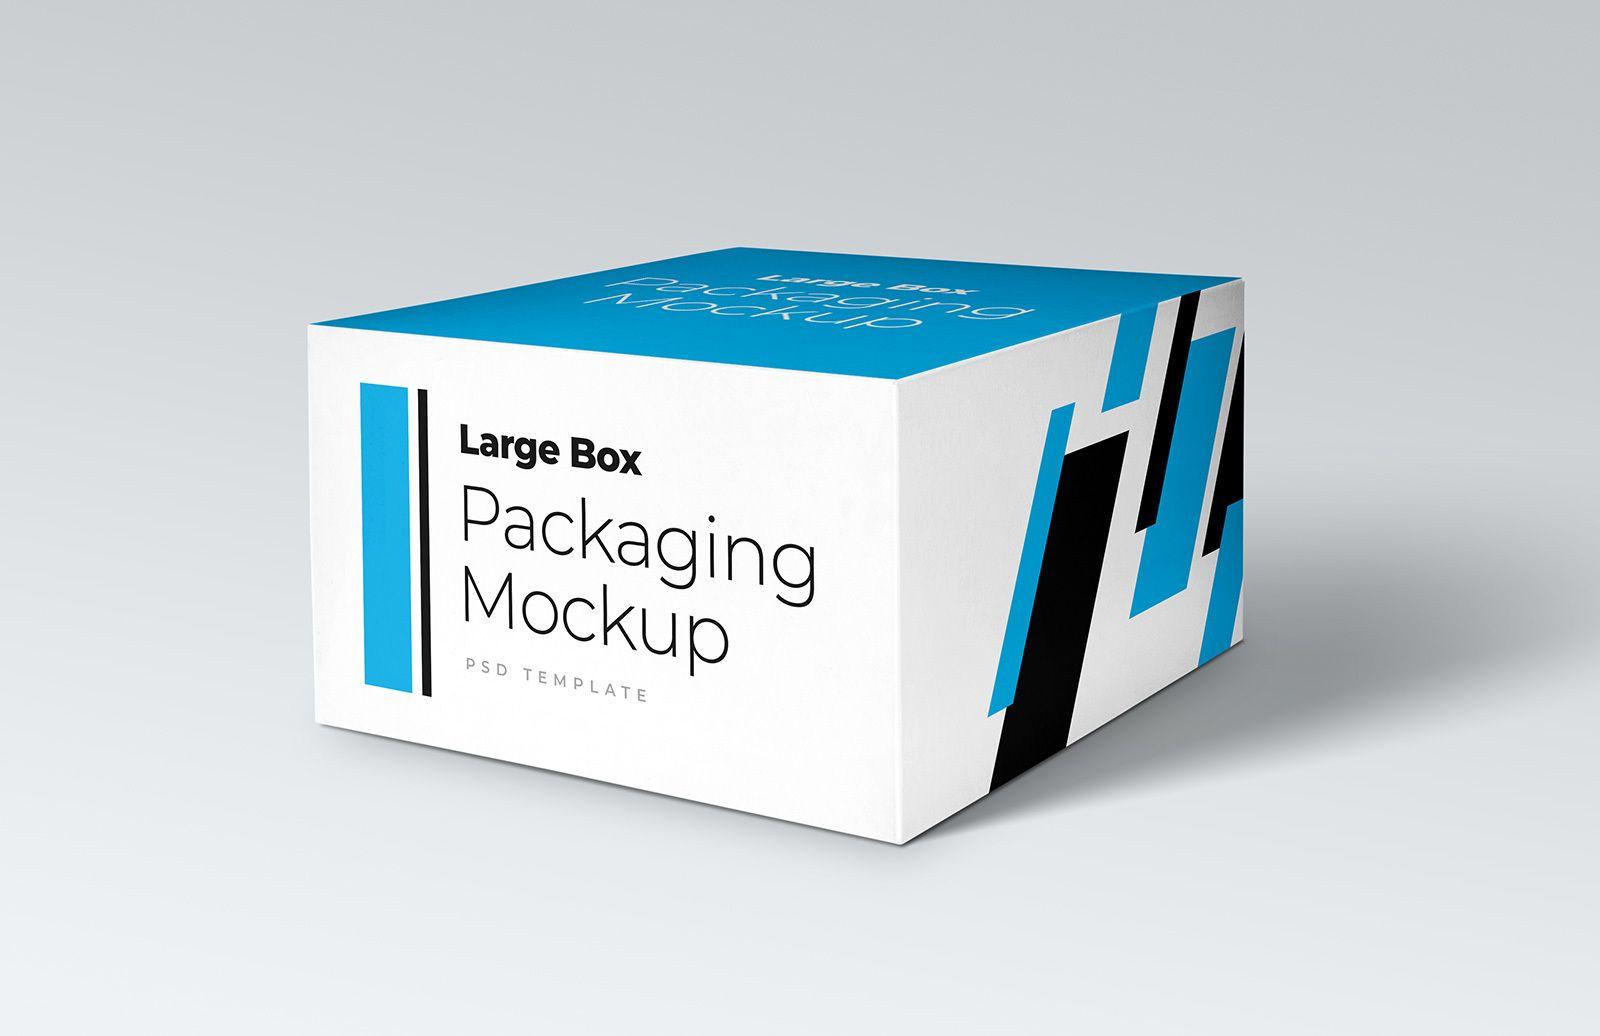 Download Free Large Box Packaging Mockup Packaging Mockup Box Packaging Custom Packaging Boxes